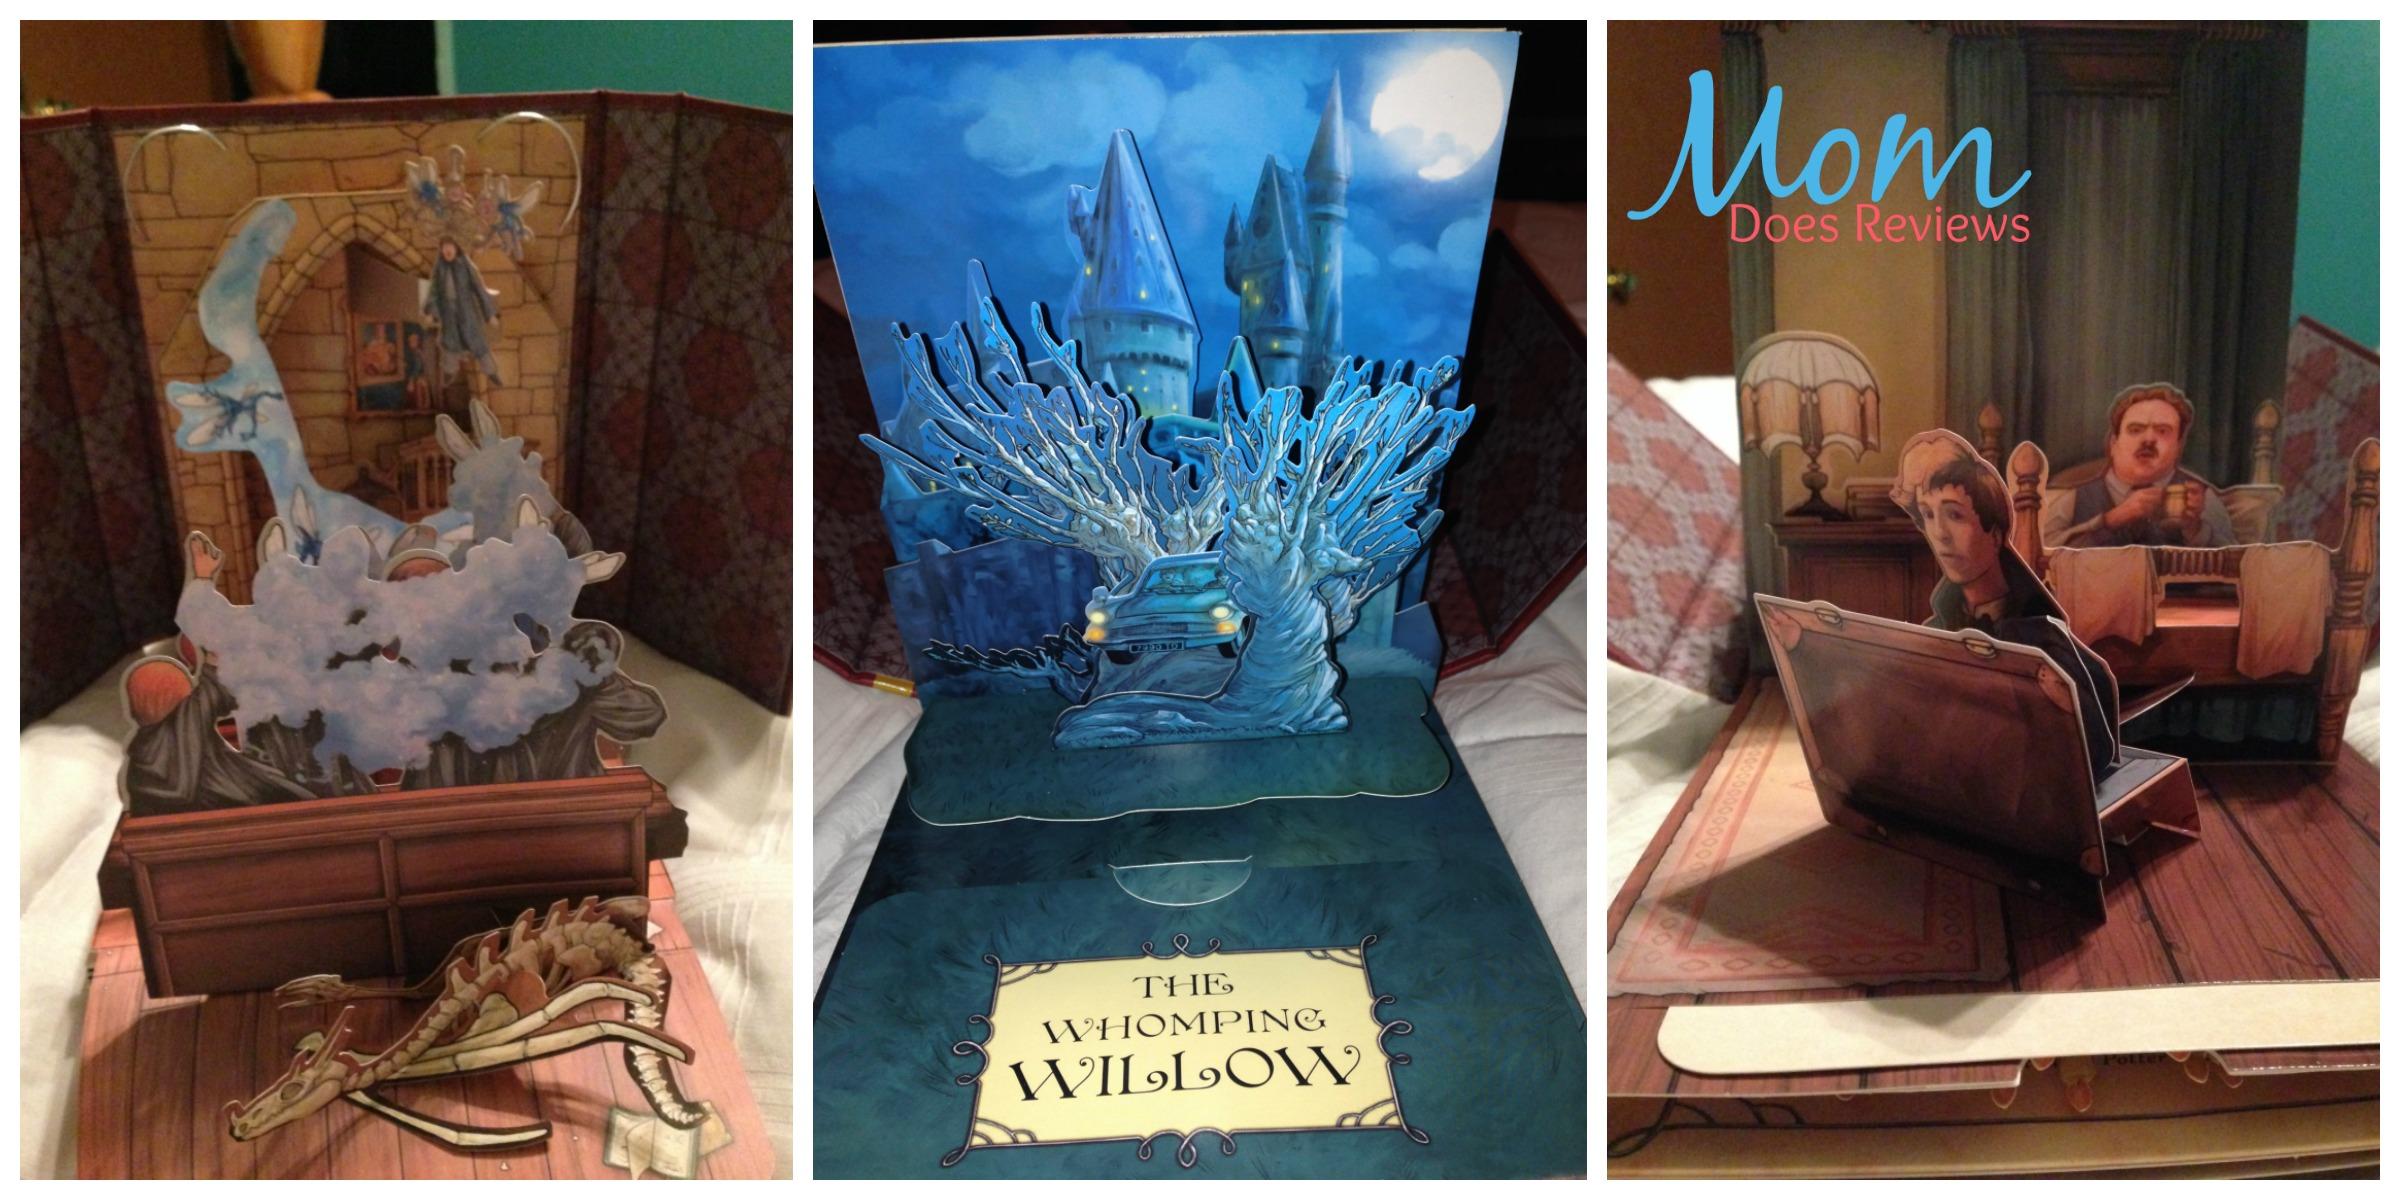 Rowlings Wizarding World A Pop-up Gallery of Curiosities J.K